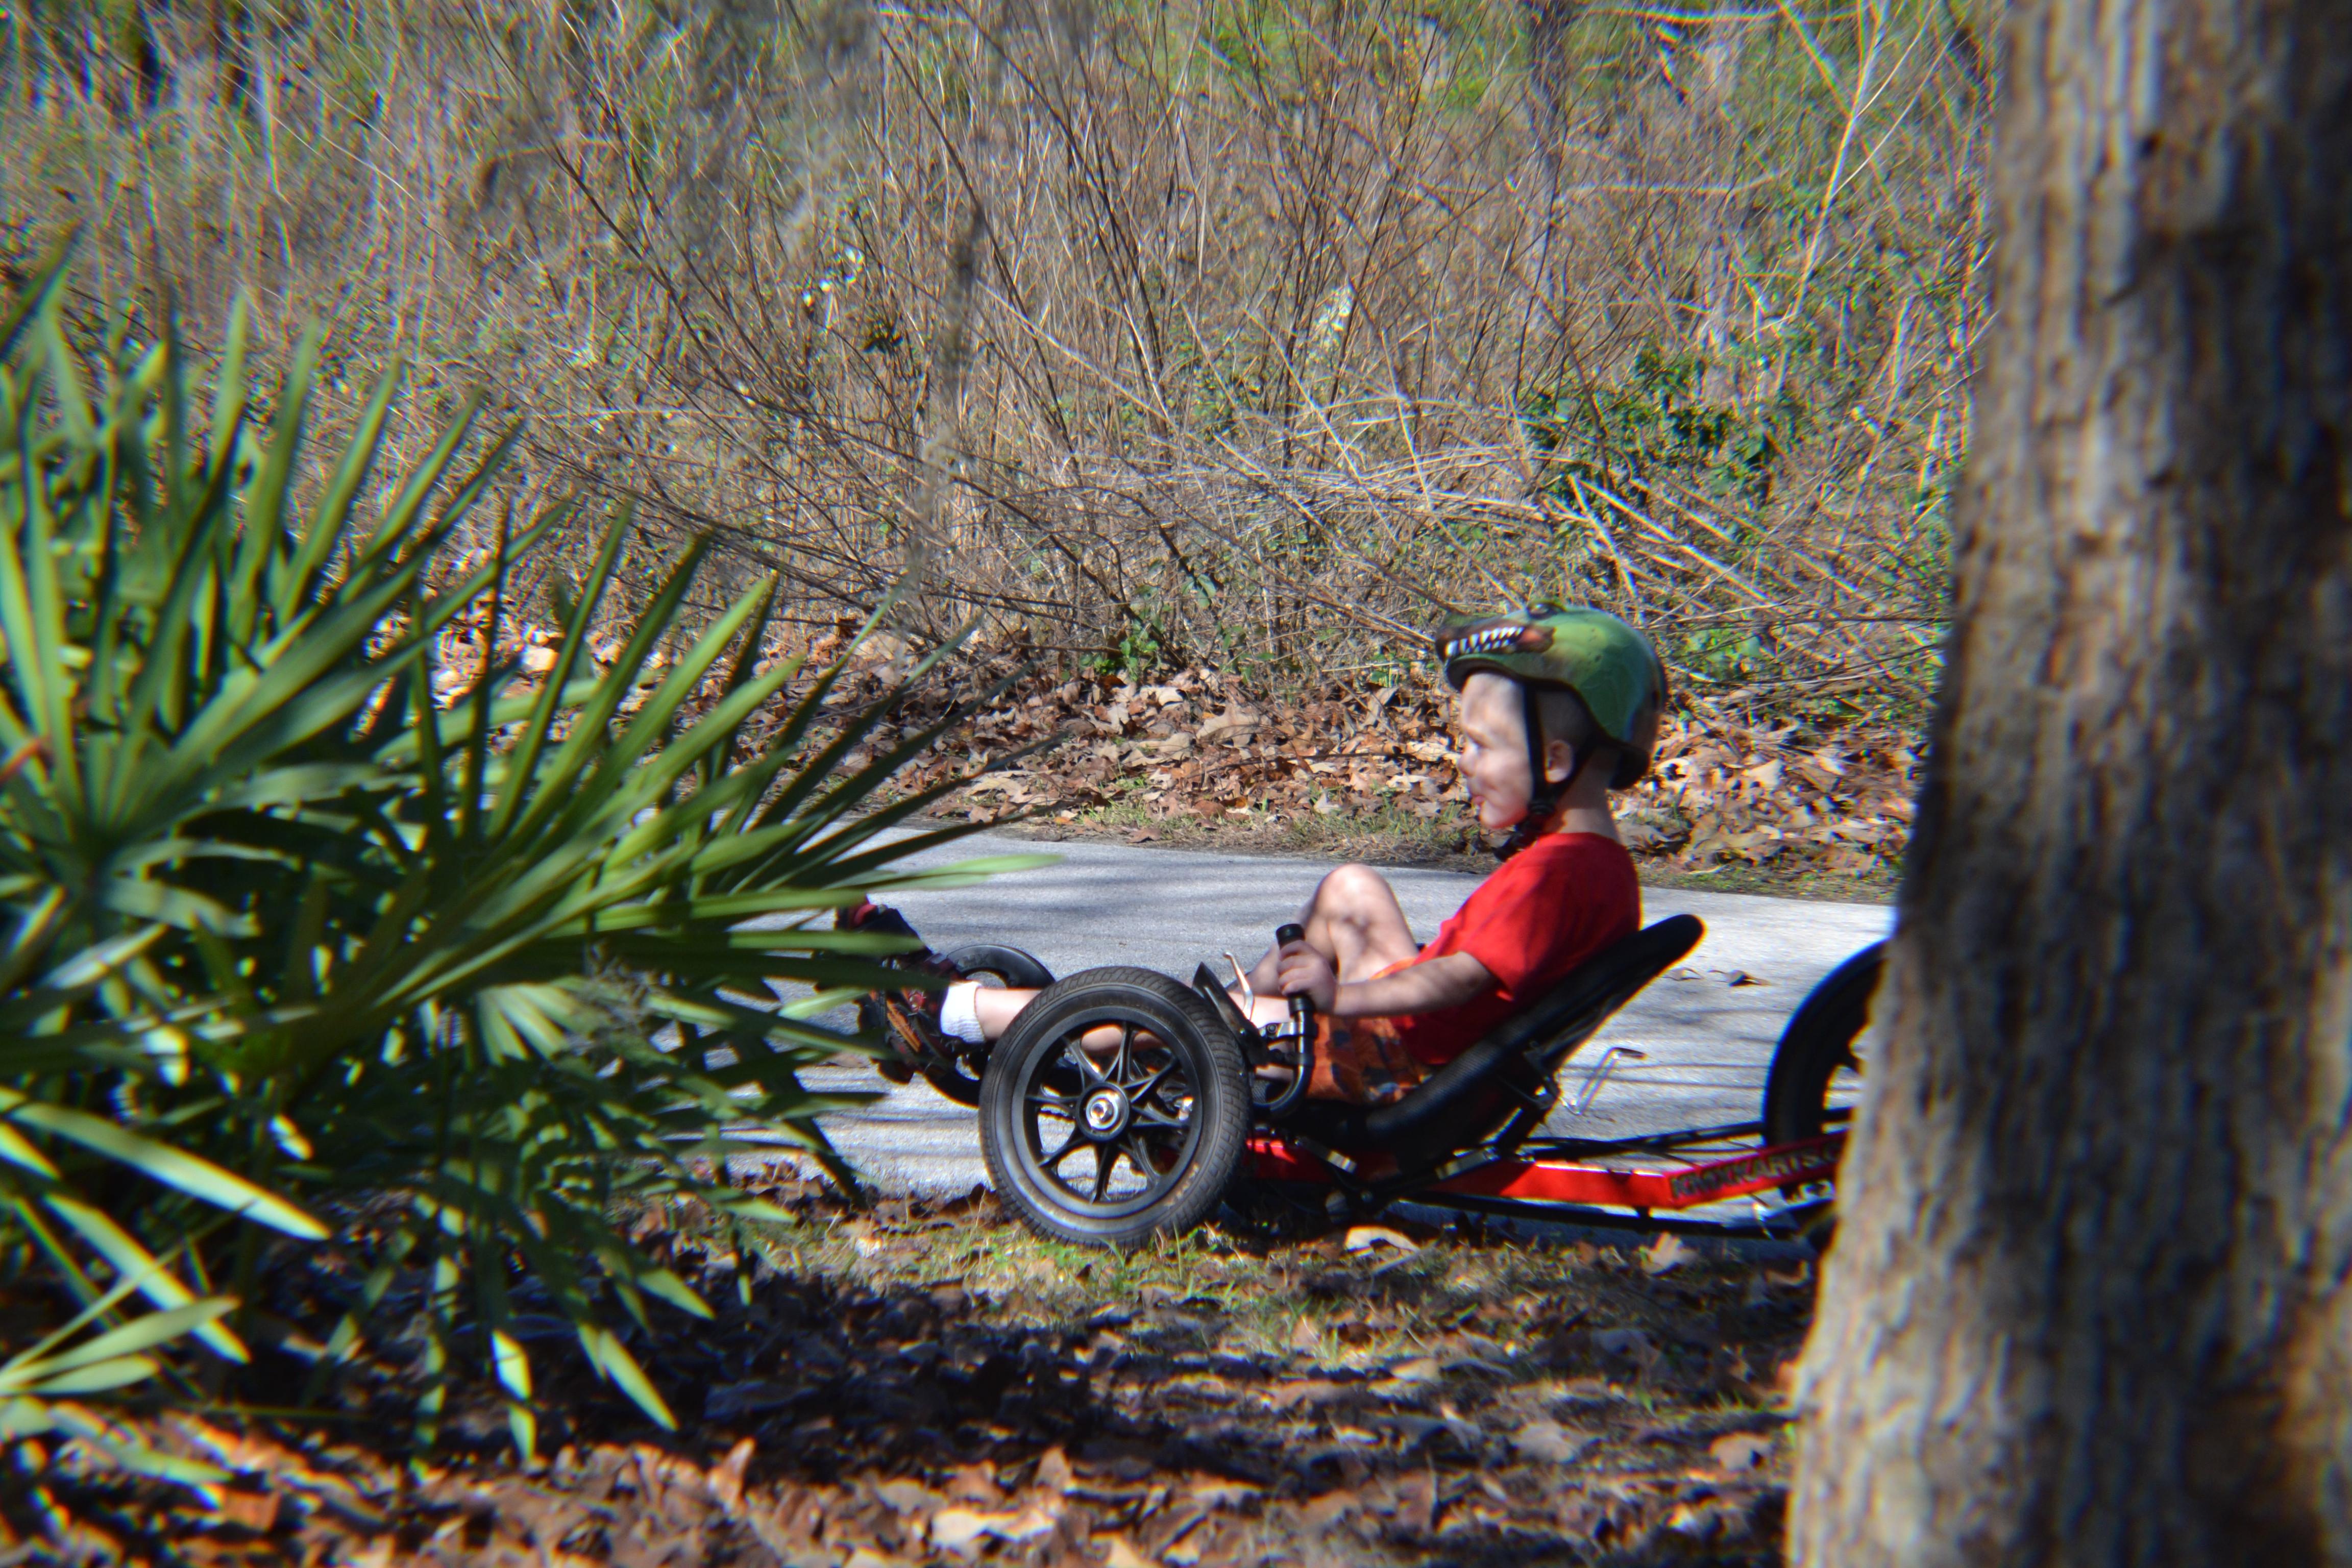 Kaelin on the Marjorie Keenan Rawlins Greenway Trail last weekend